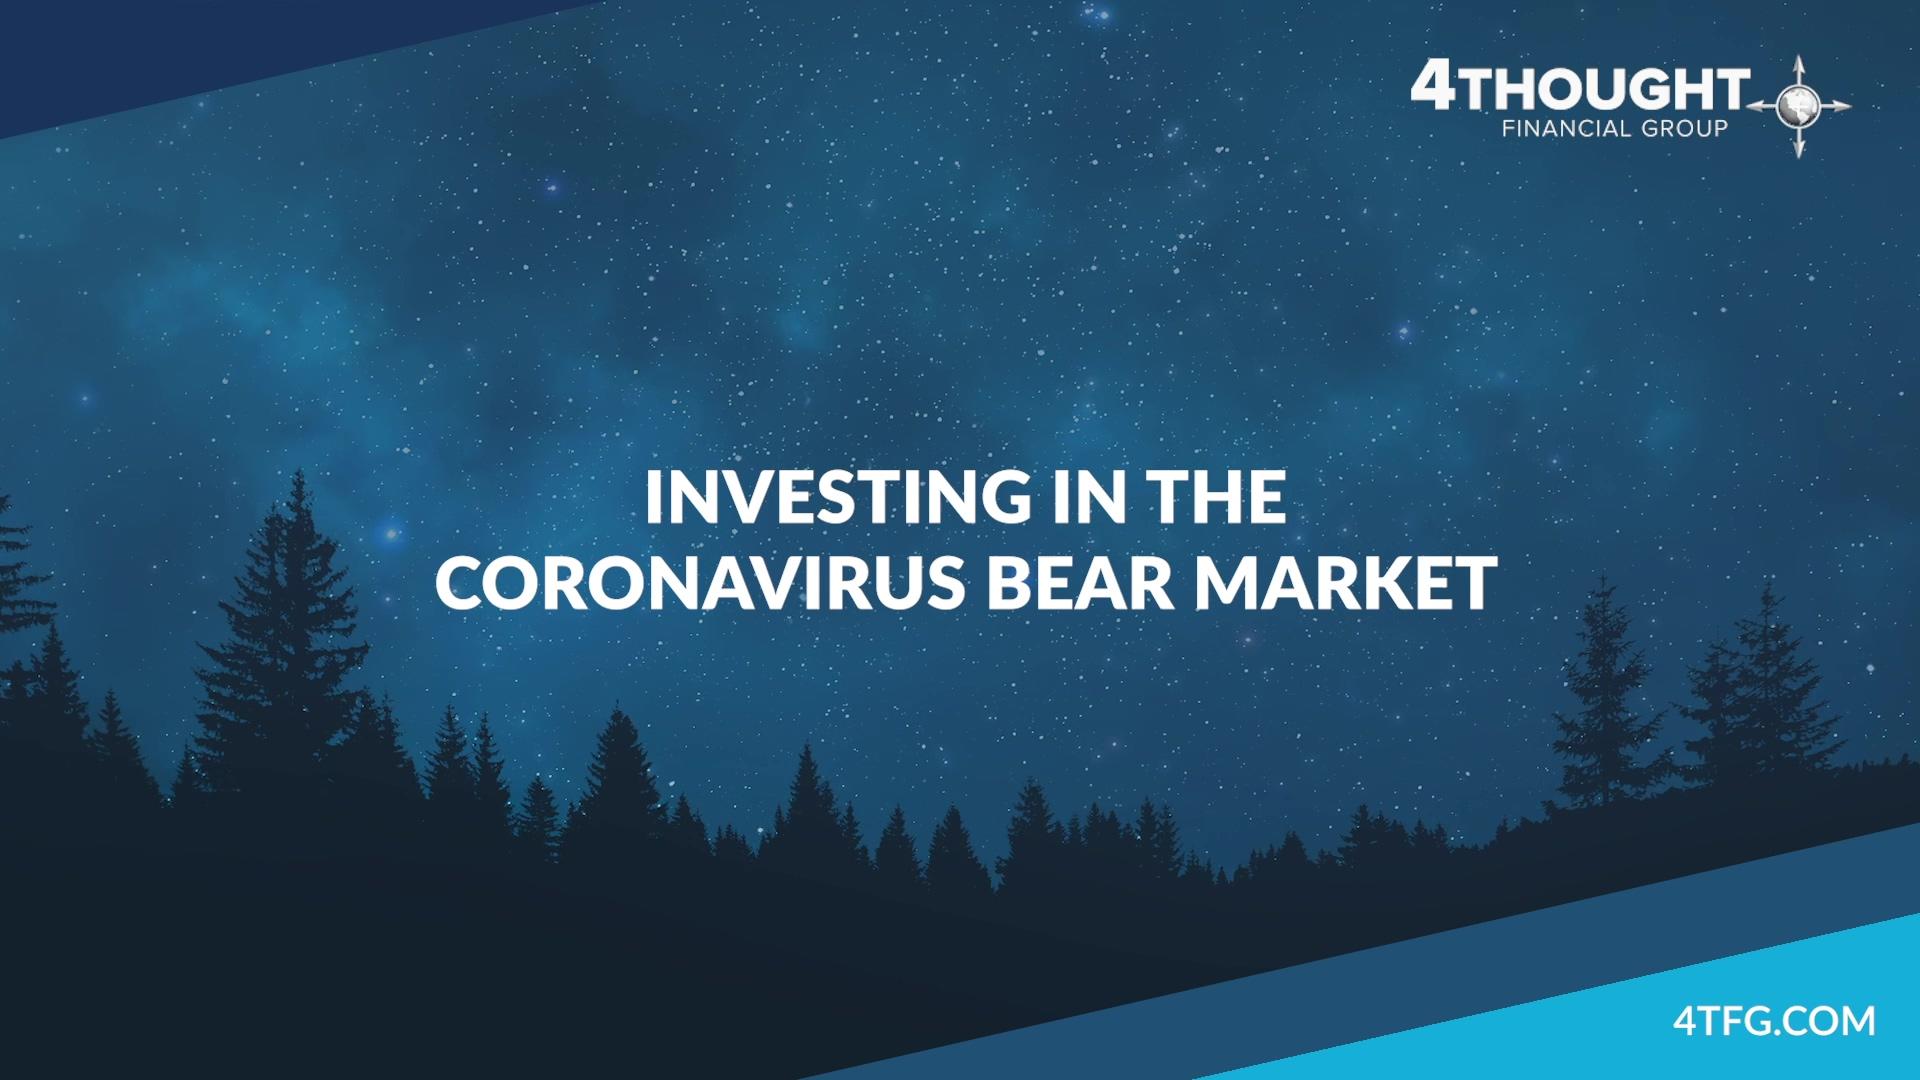 Investing in the Coronavirus Bear Market